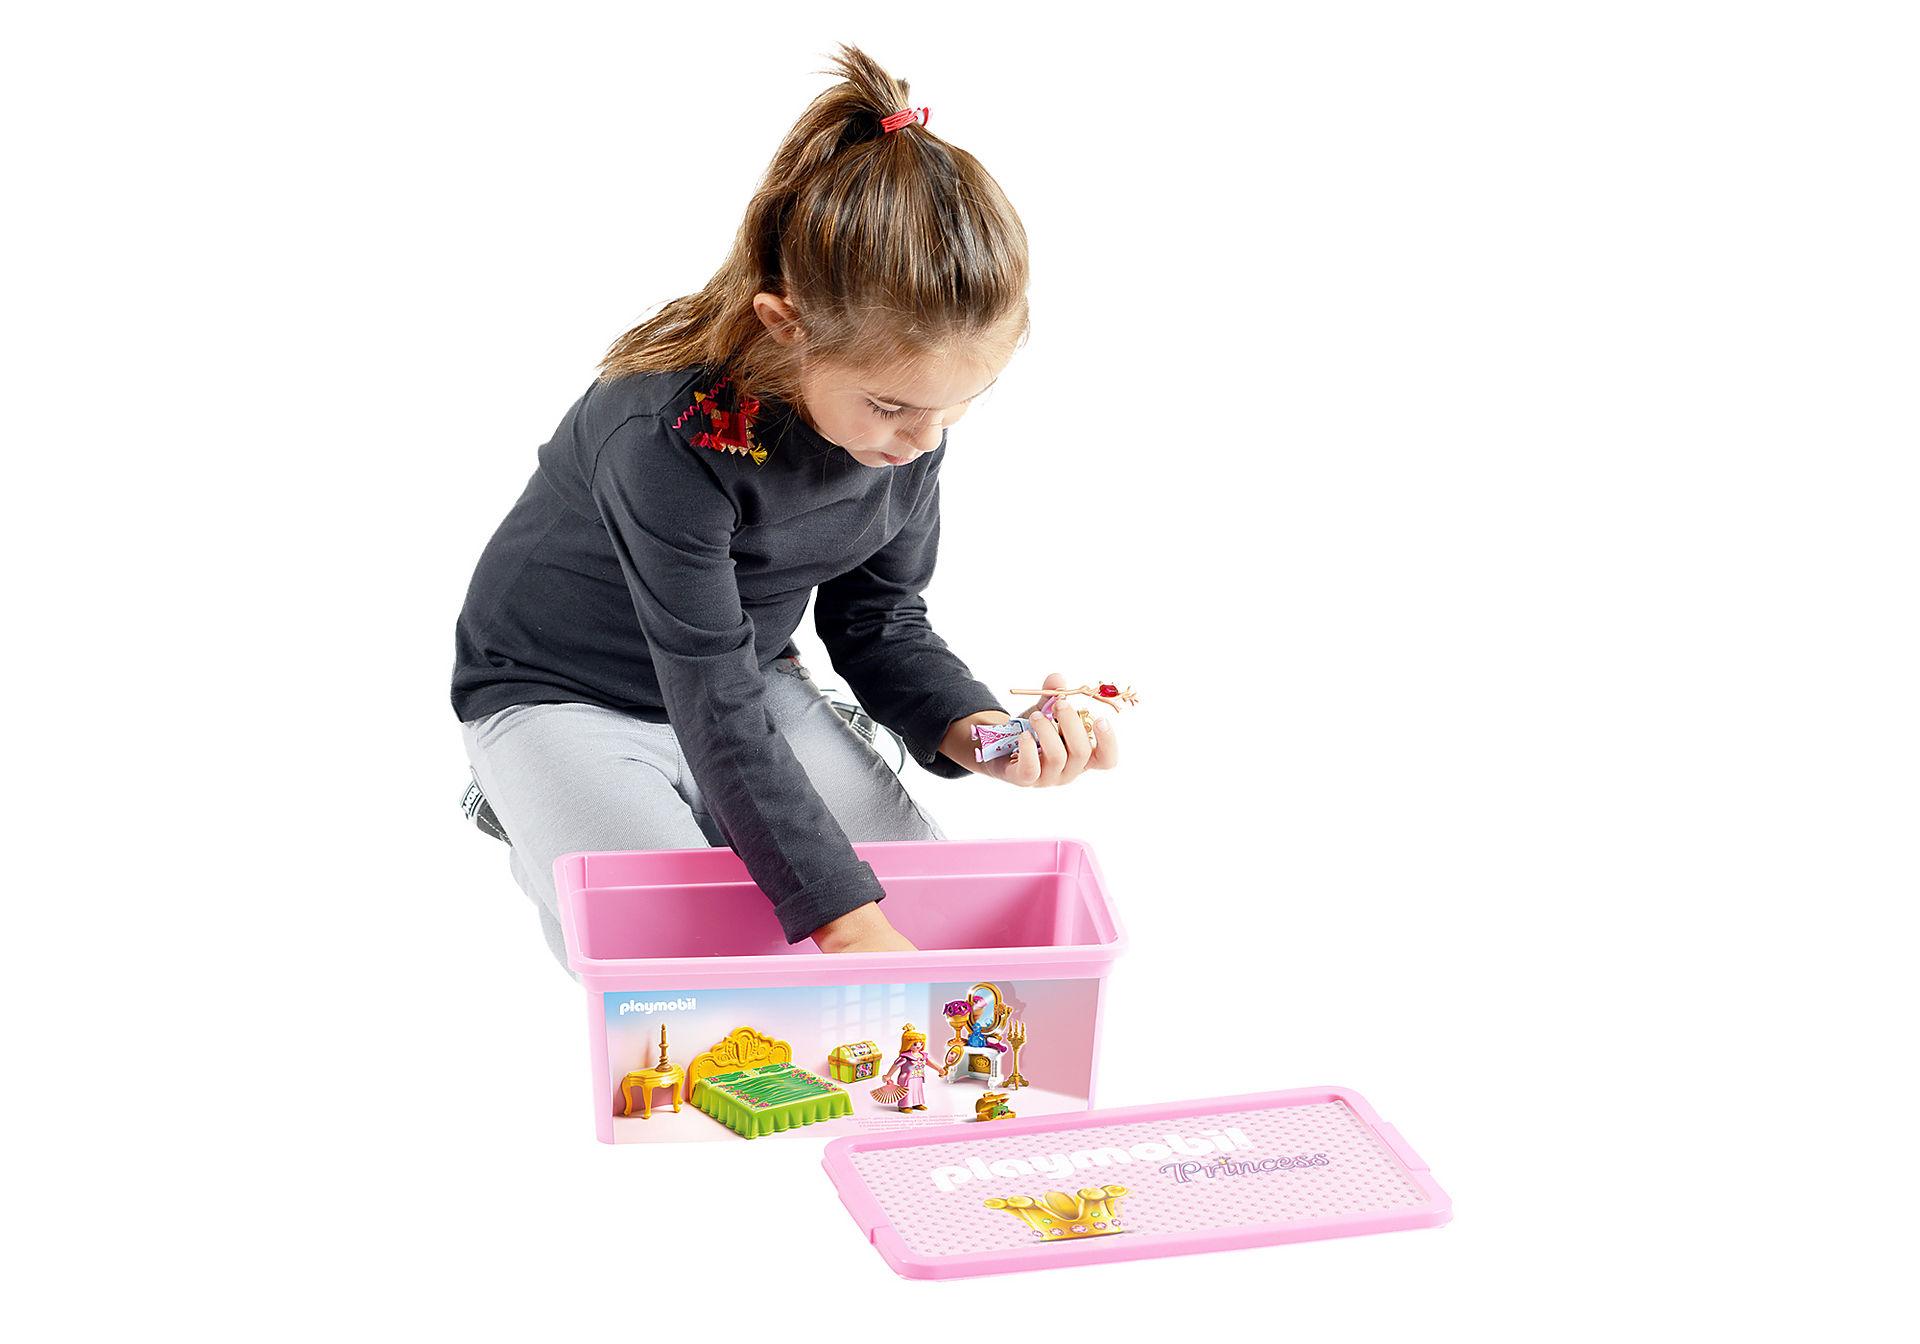 http://media.playmobil.com/i/playmobil/80490_product_extra2/6L Prinzessinen Aufbewahrungsbox